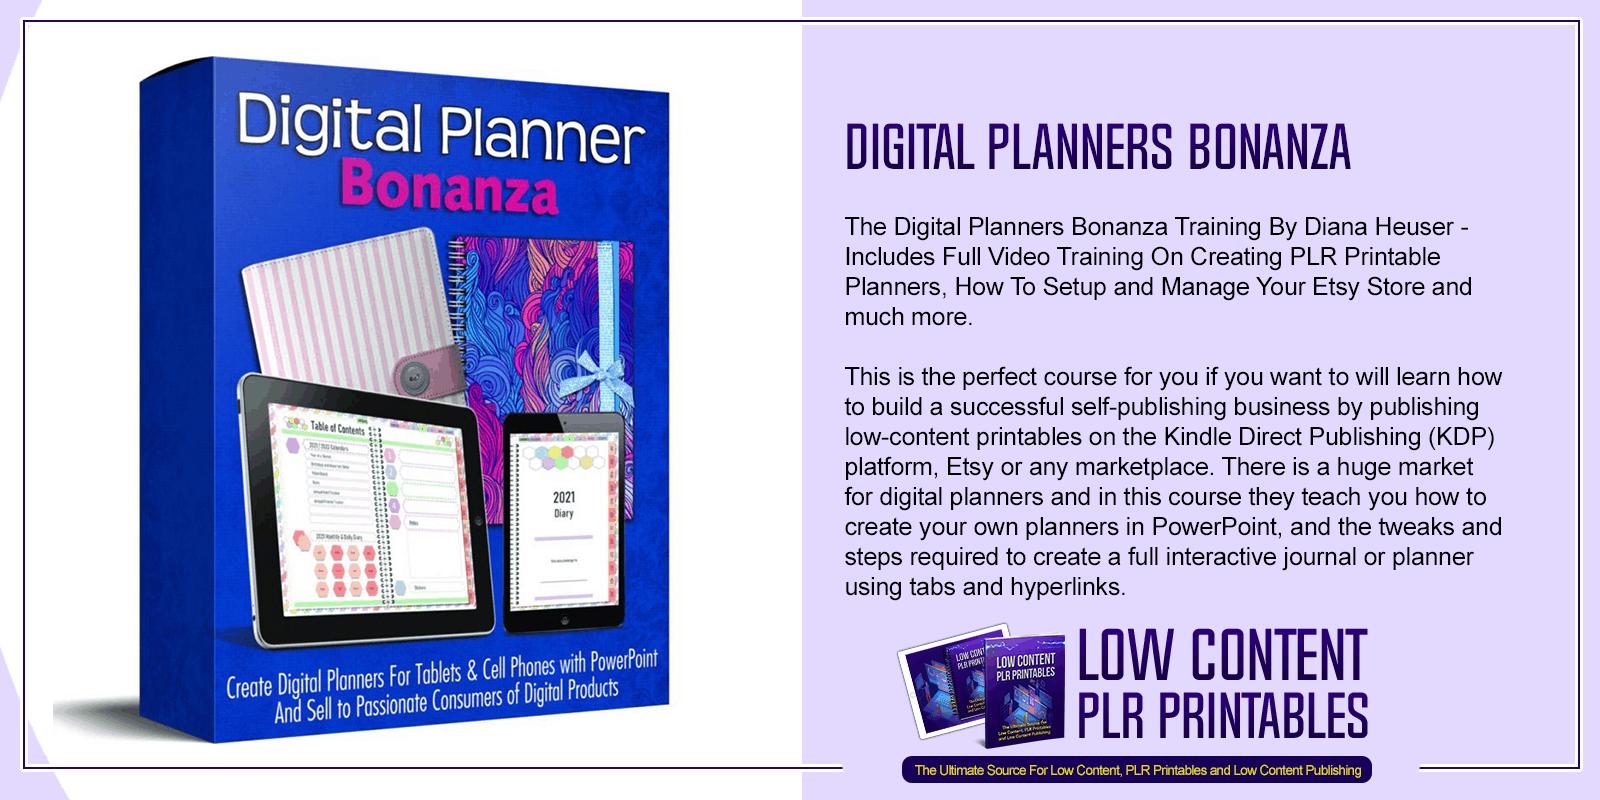 Digital Planners Bonanza